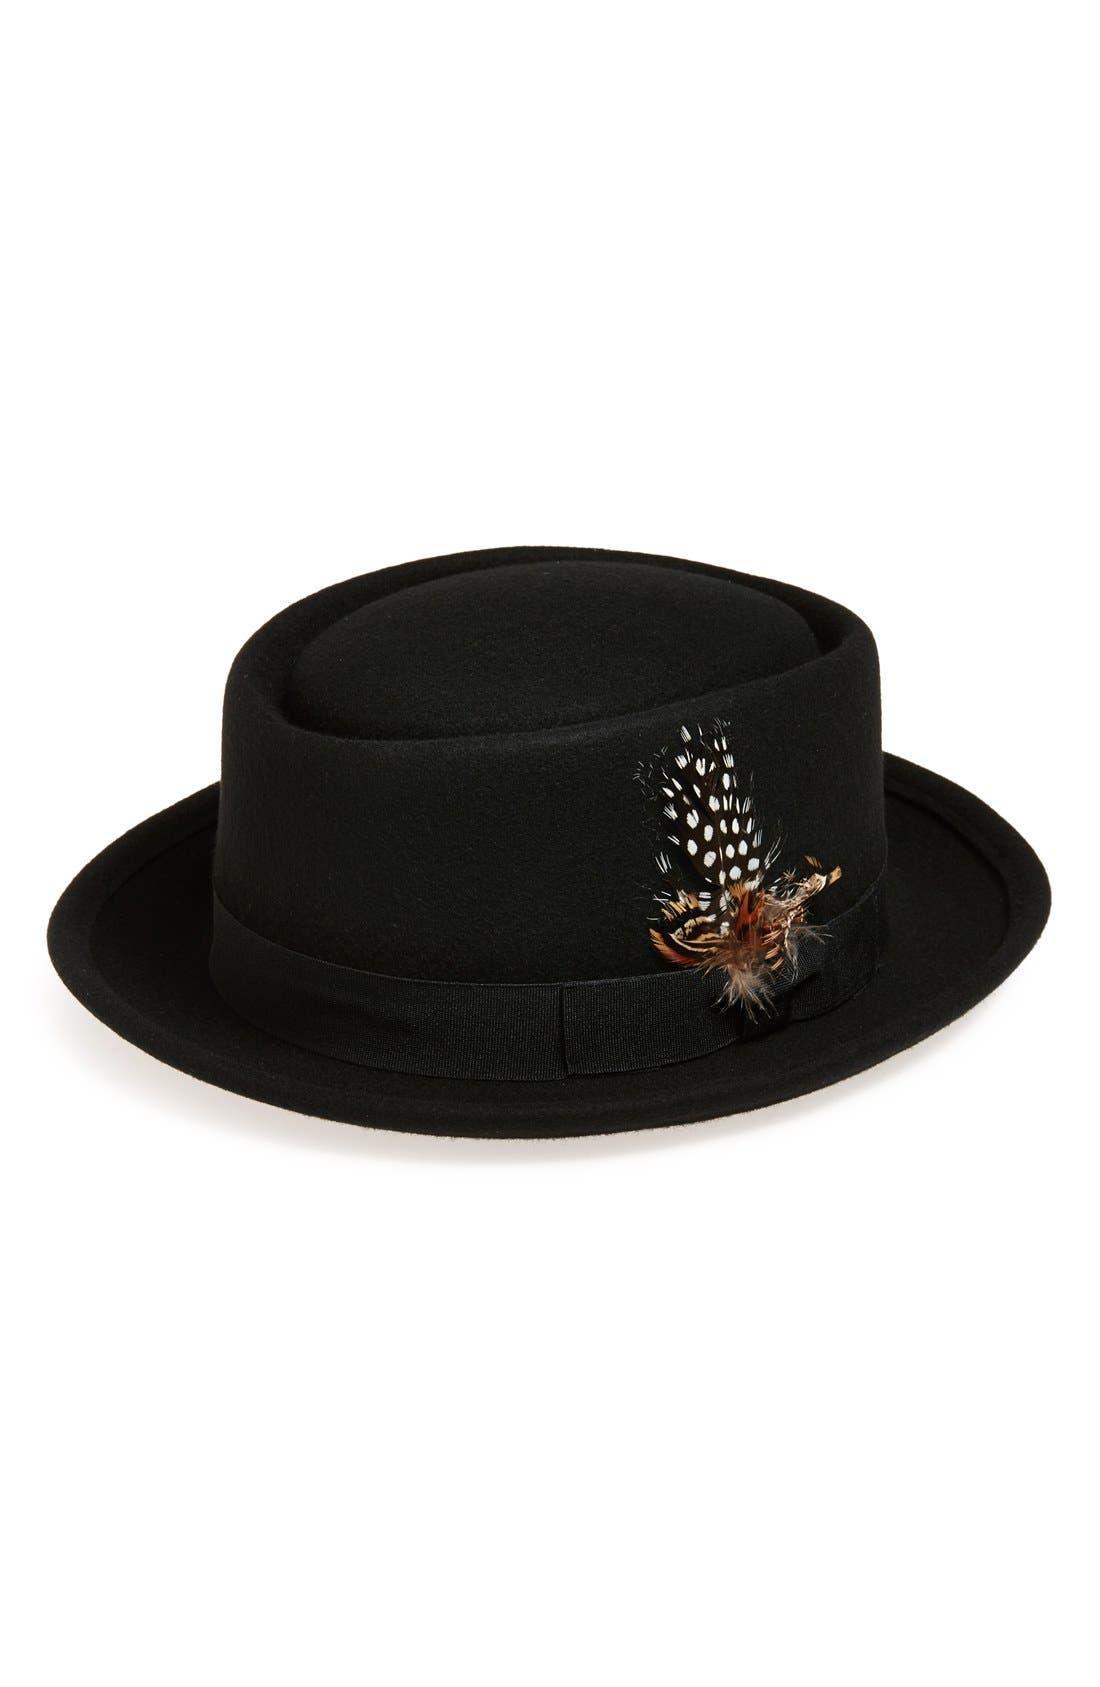 Alternate Image 1 Selected - Tildon Feather Embellished Wool Bowler Hat